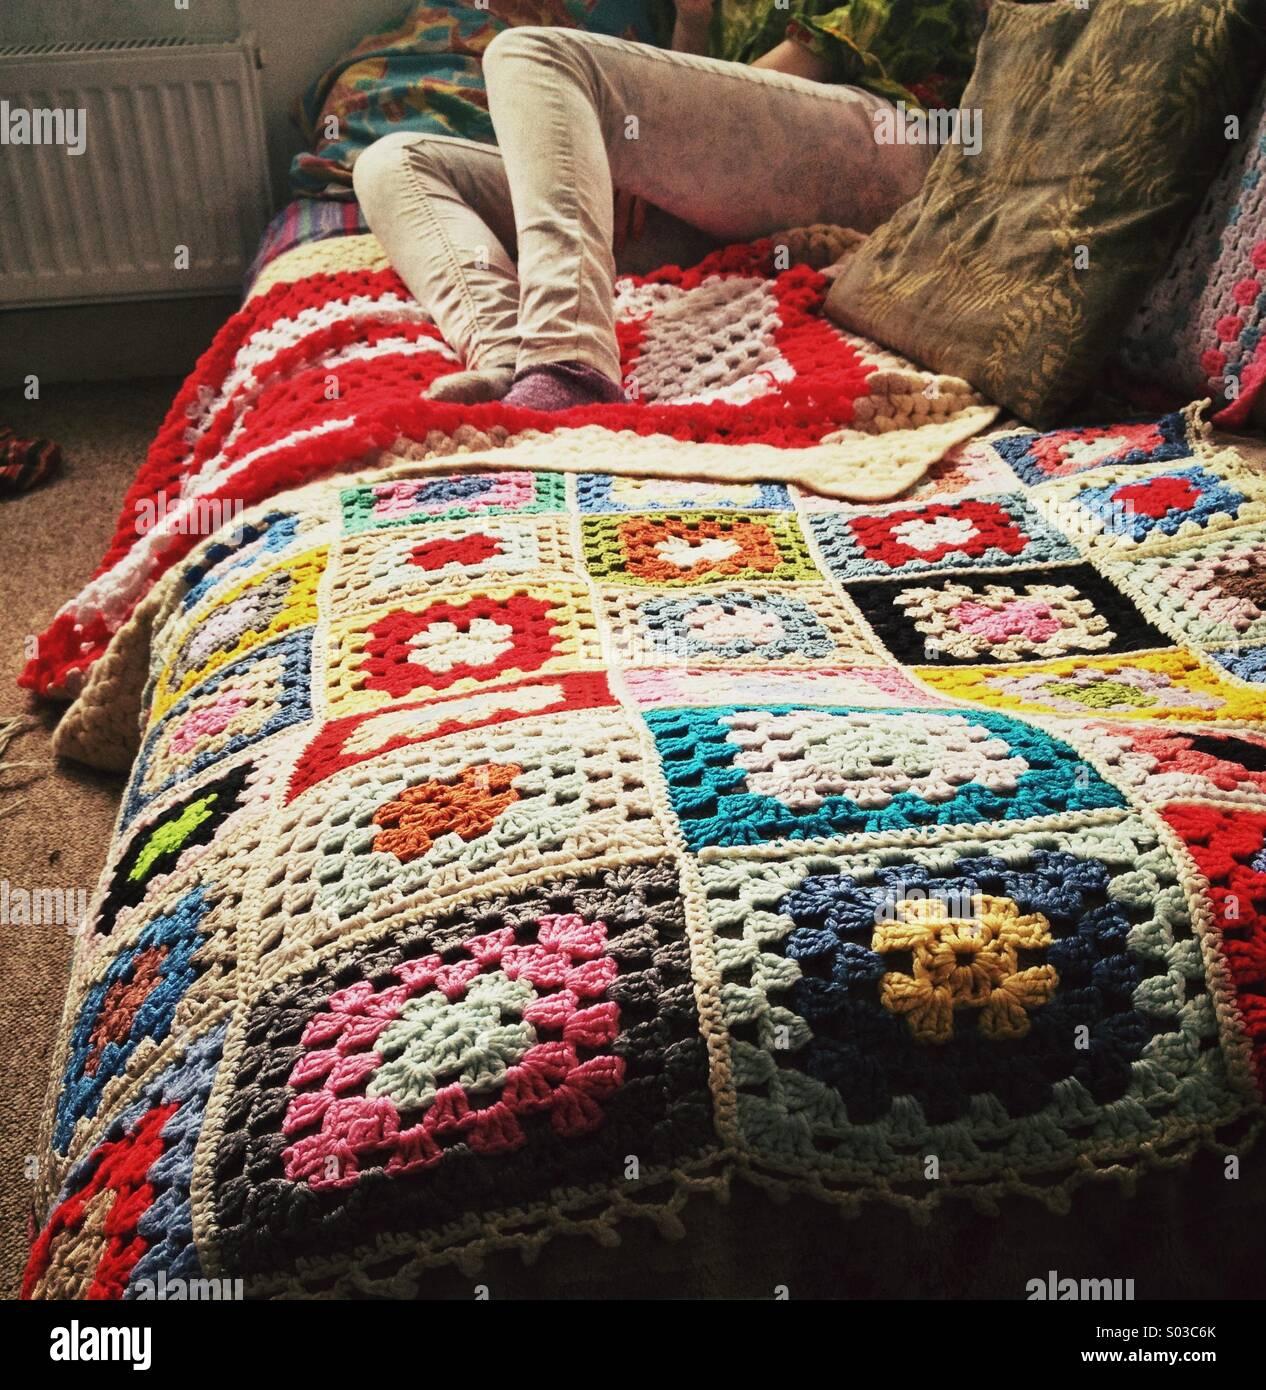 Lazy, teenager sitting on patchwork retro blanket - Stock Image